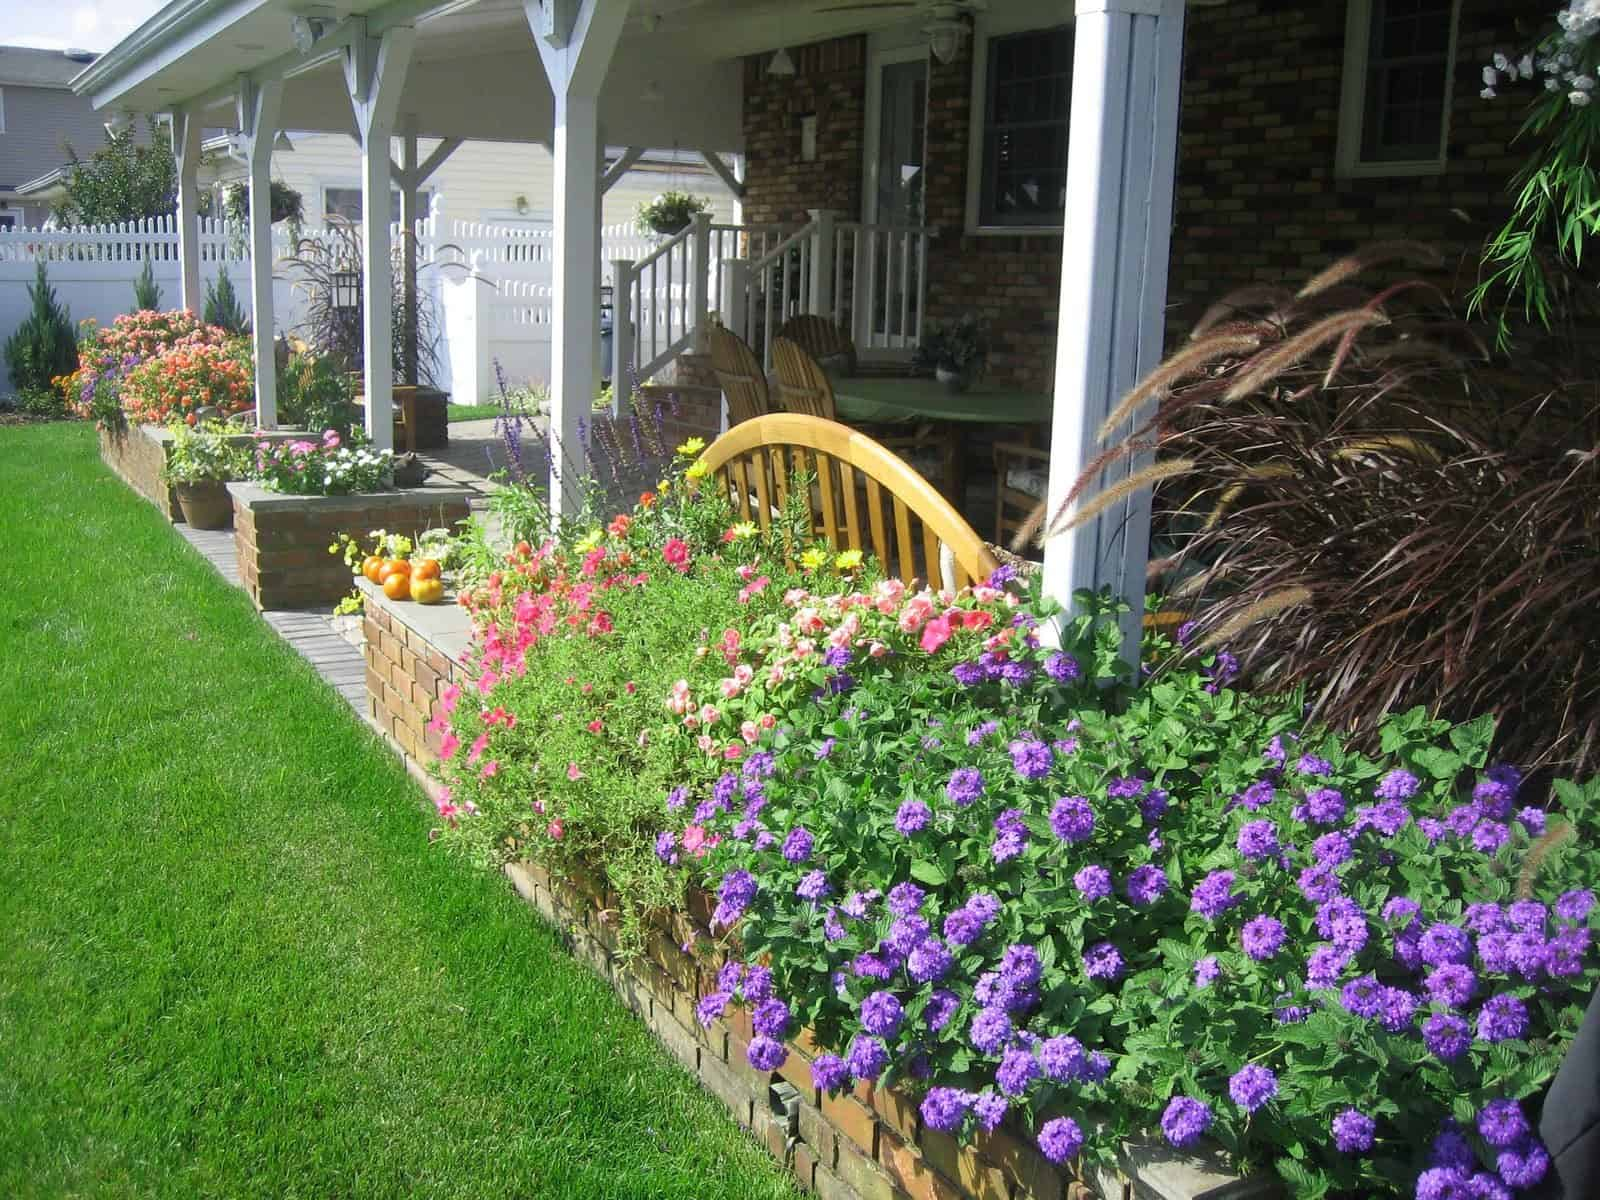 Danish Brick planter with Bluestone Cap planted with Double Impatients, Verbena, and Purple Fountain Grass - Massapequa Park, Long Island NY